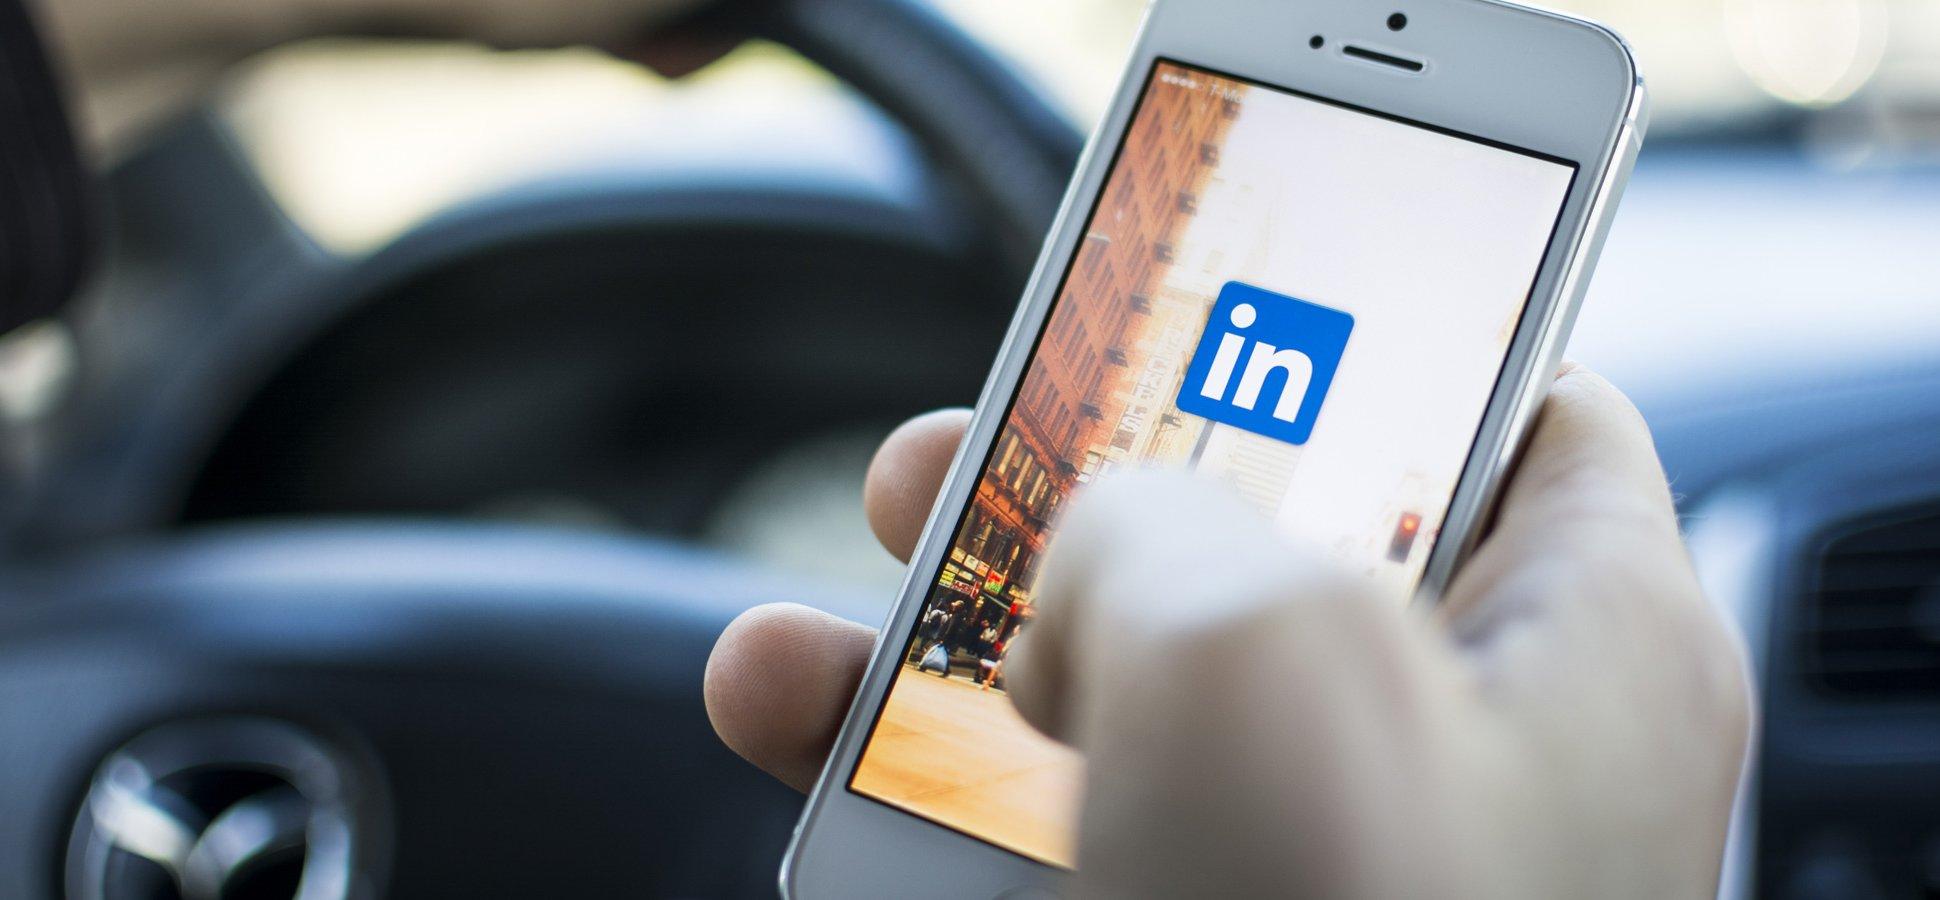 Rusya'da LinkedIn'e erişim engellendi